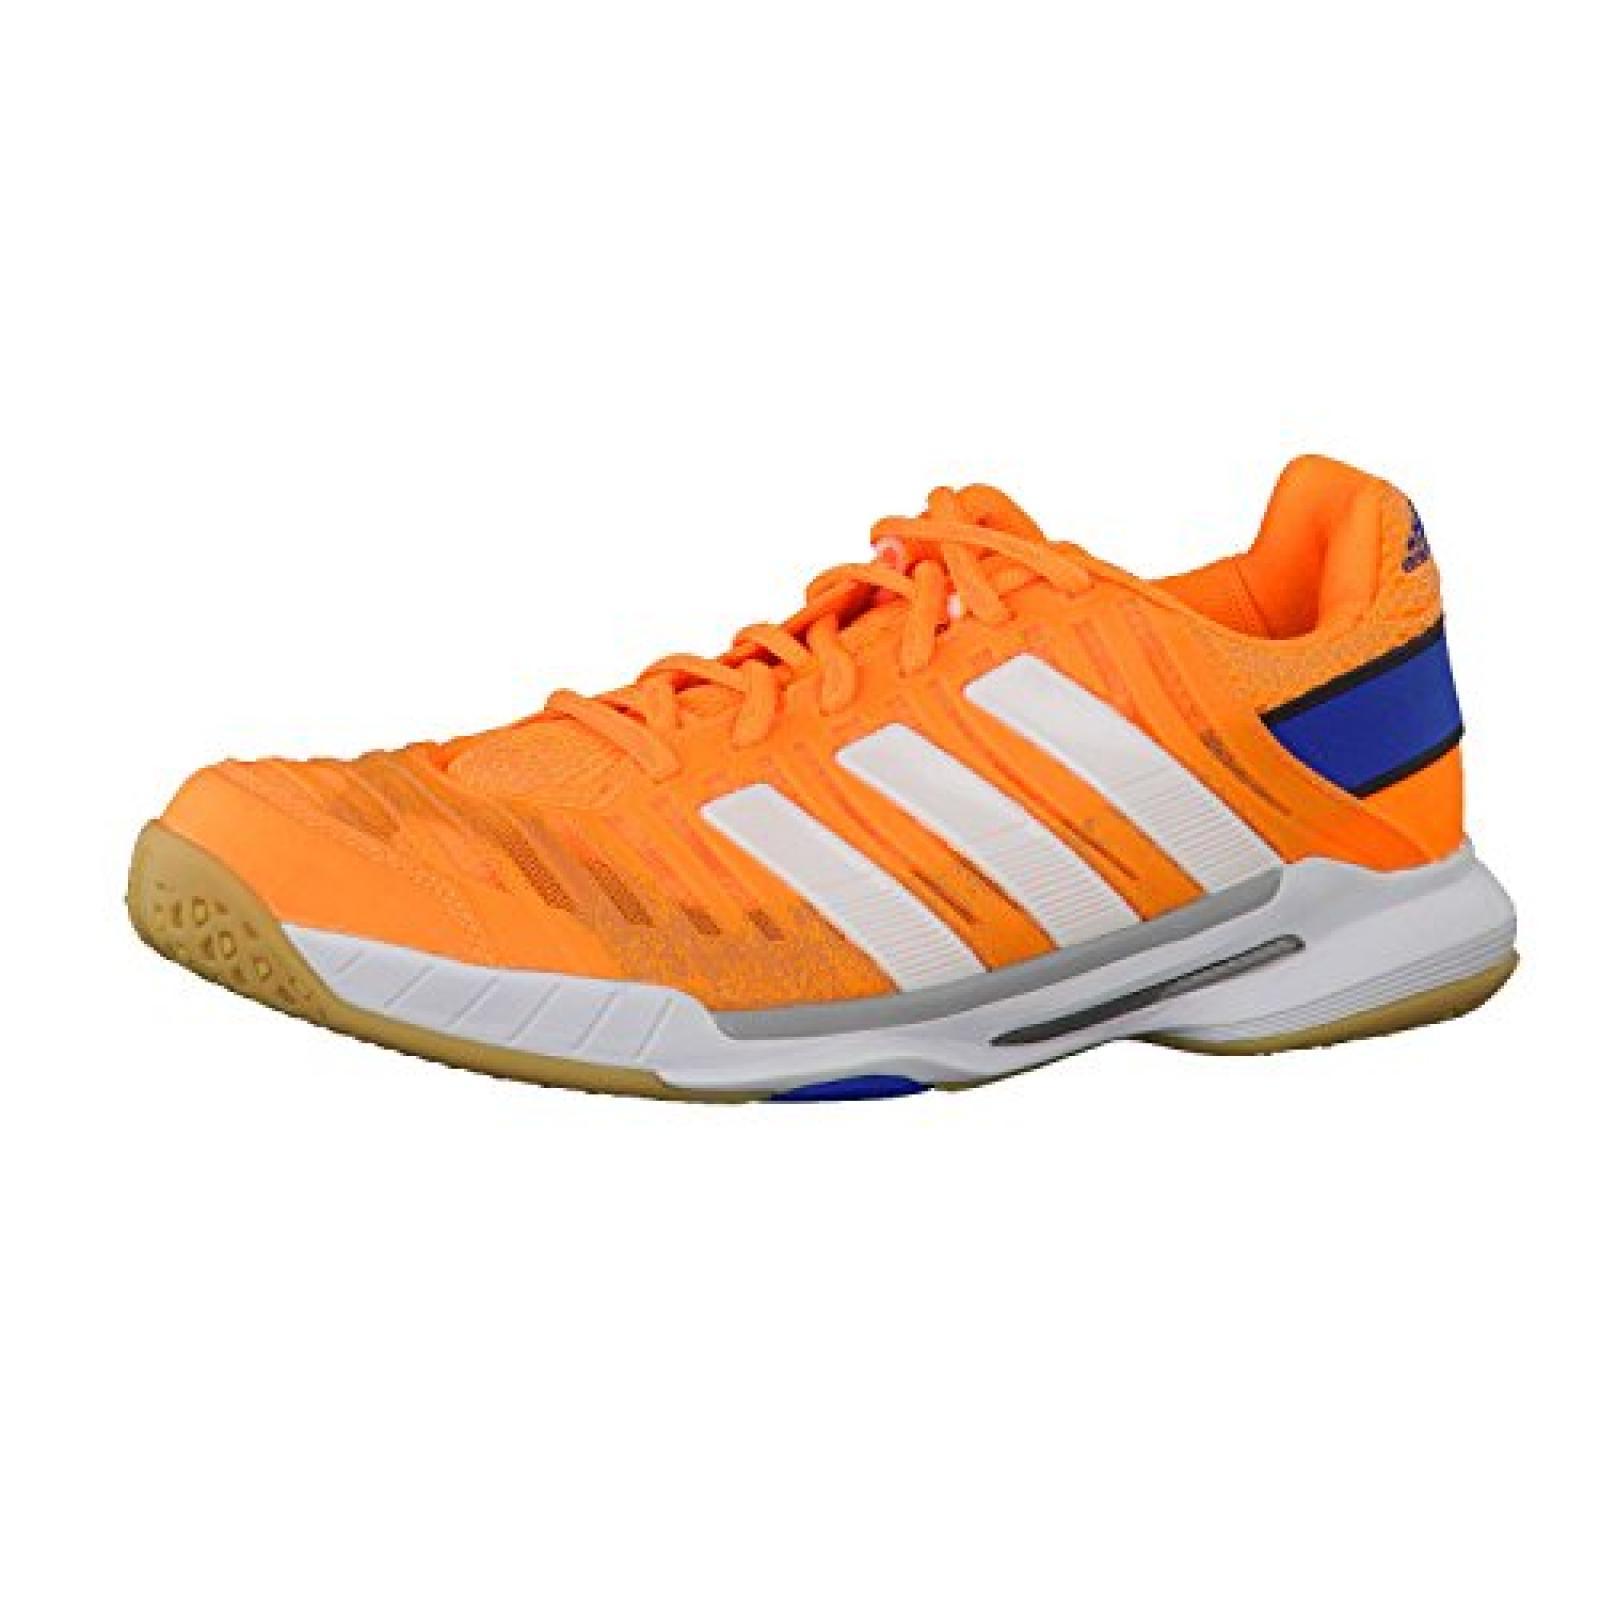 adidas adiPower Stabil 10.1 Handballschuh Herren